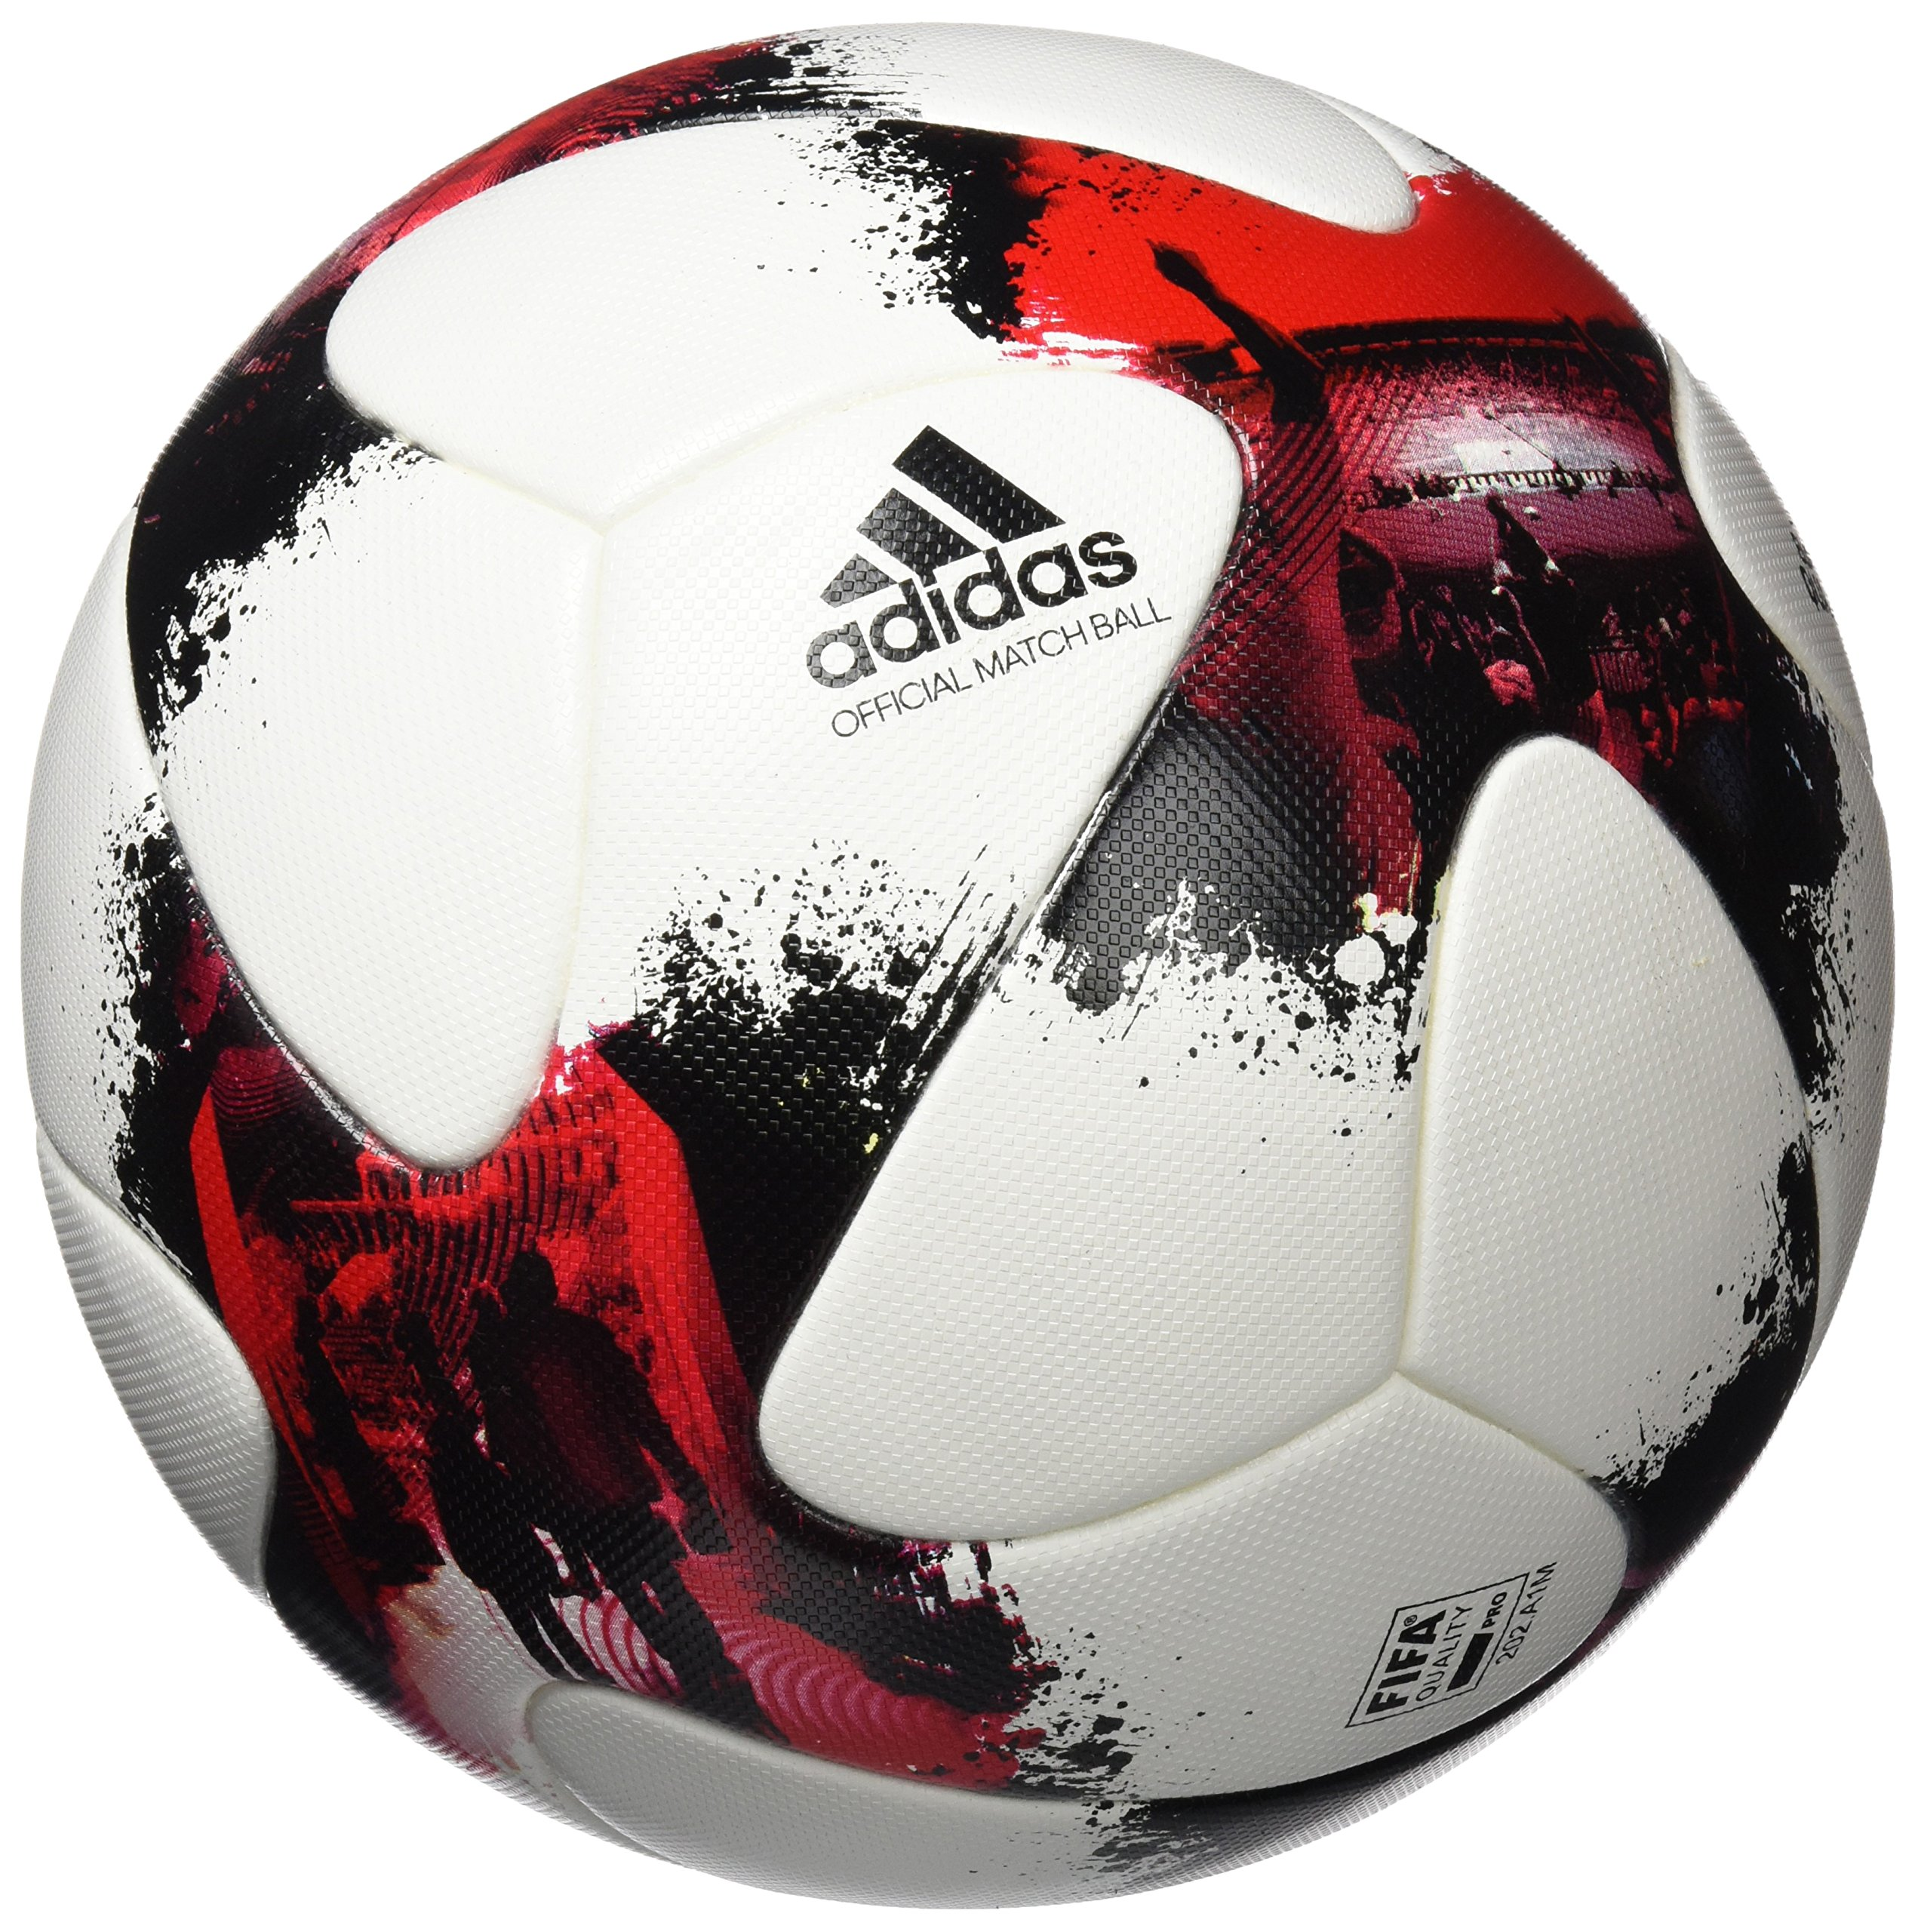 Adidas European Qualifiers World Cup Rusia 2018 Official Match Ball - Soccer Ball